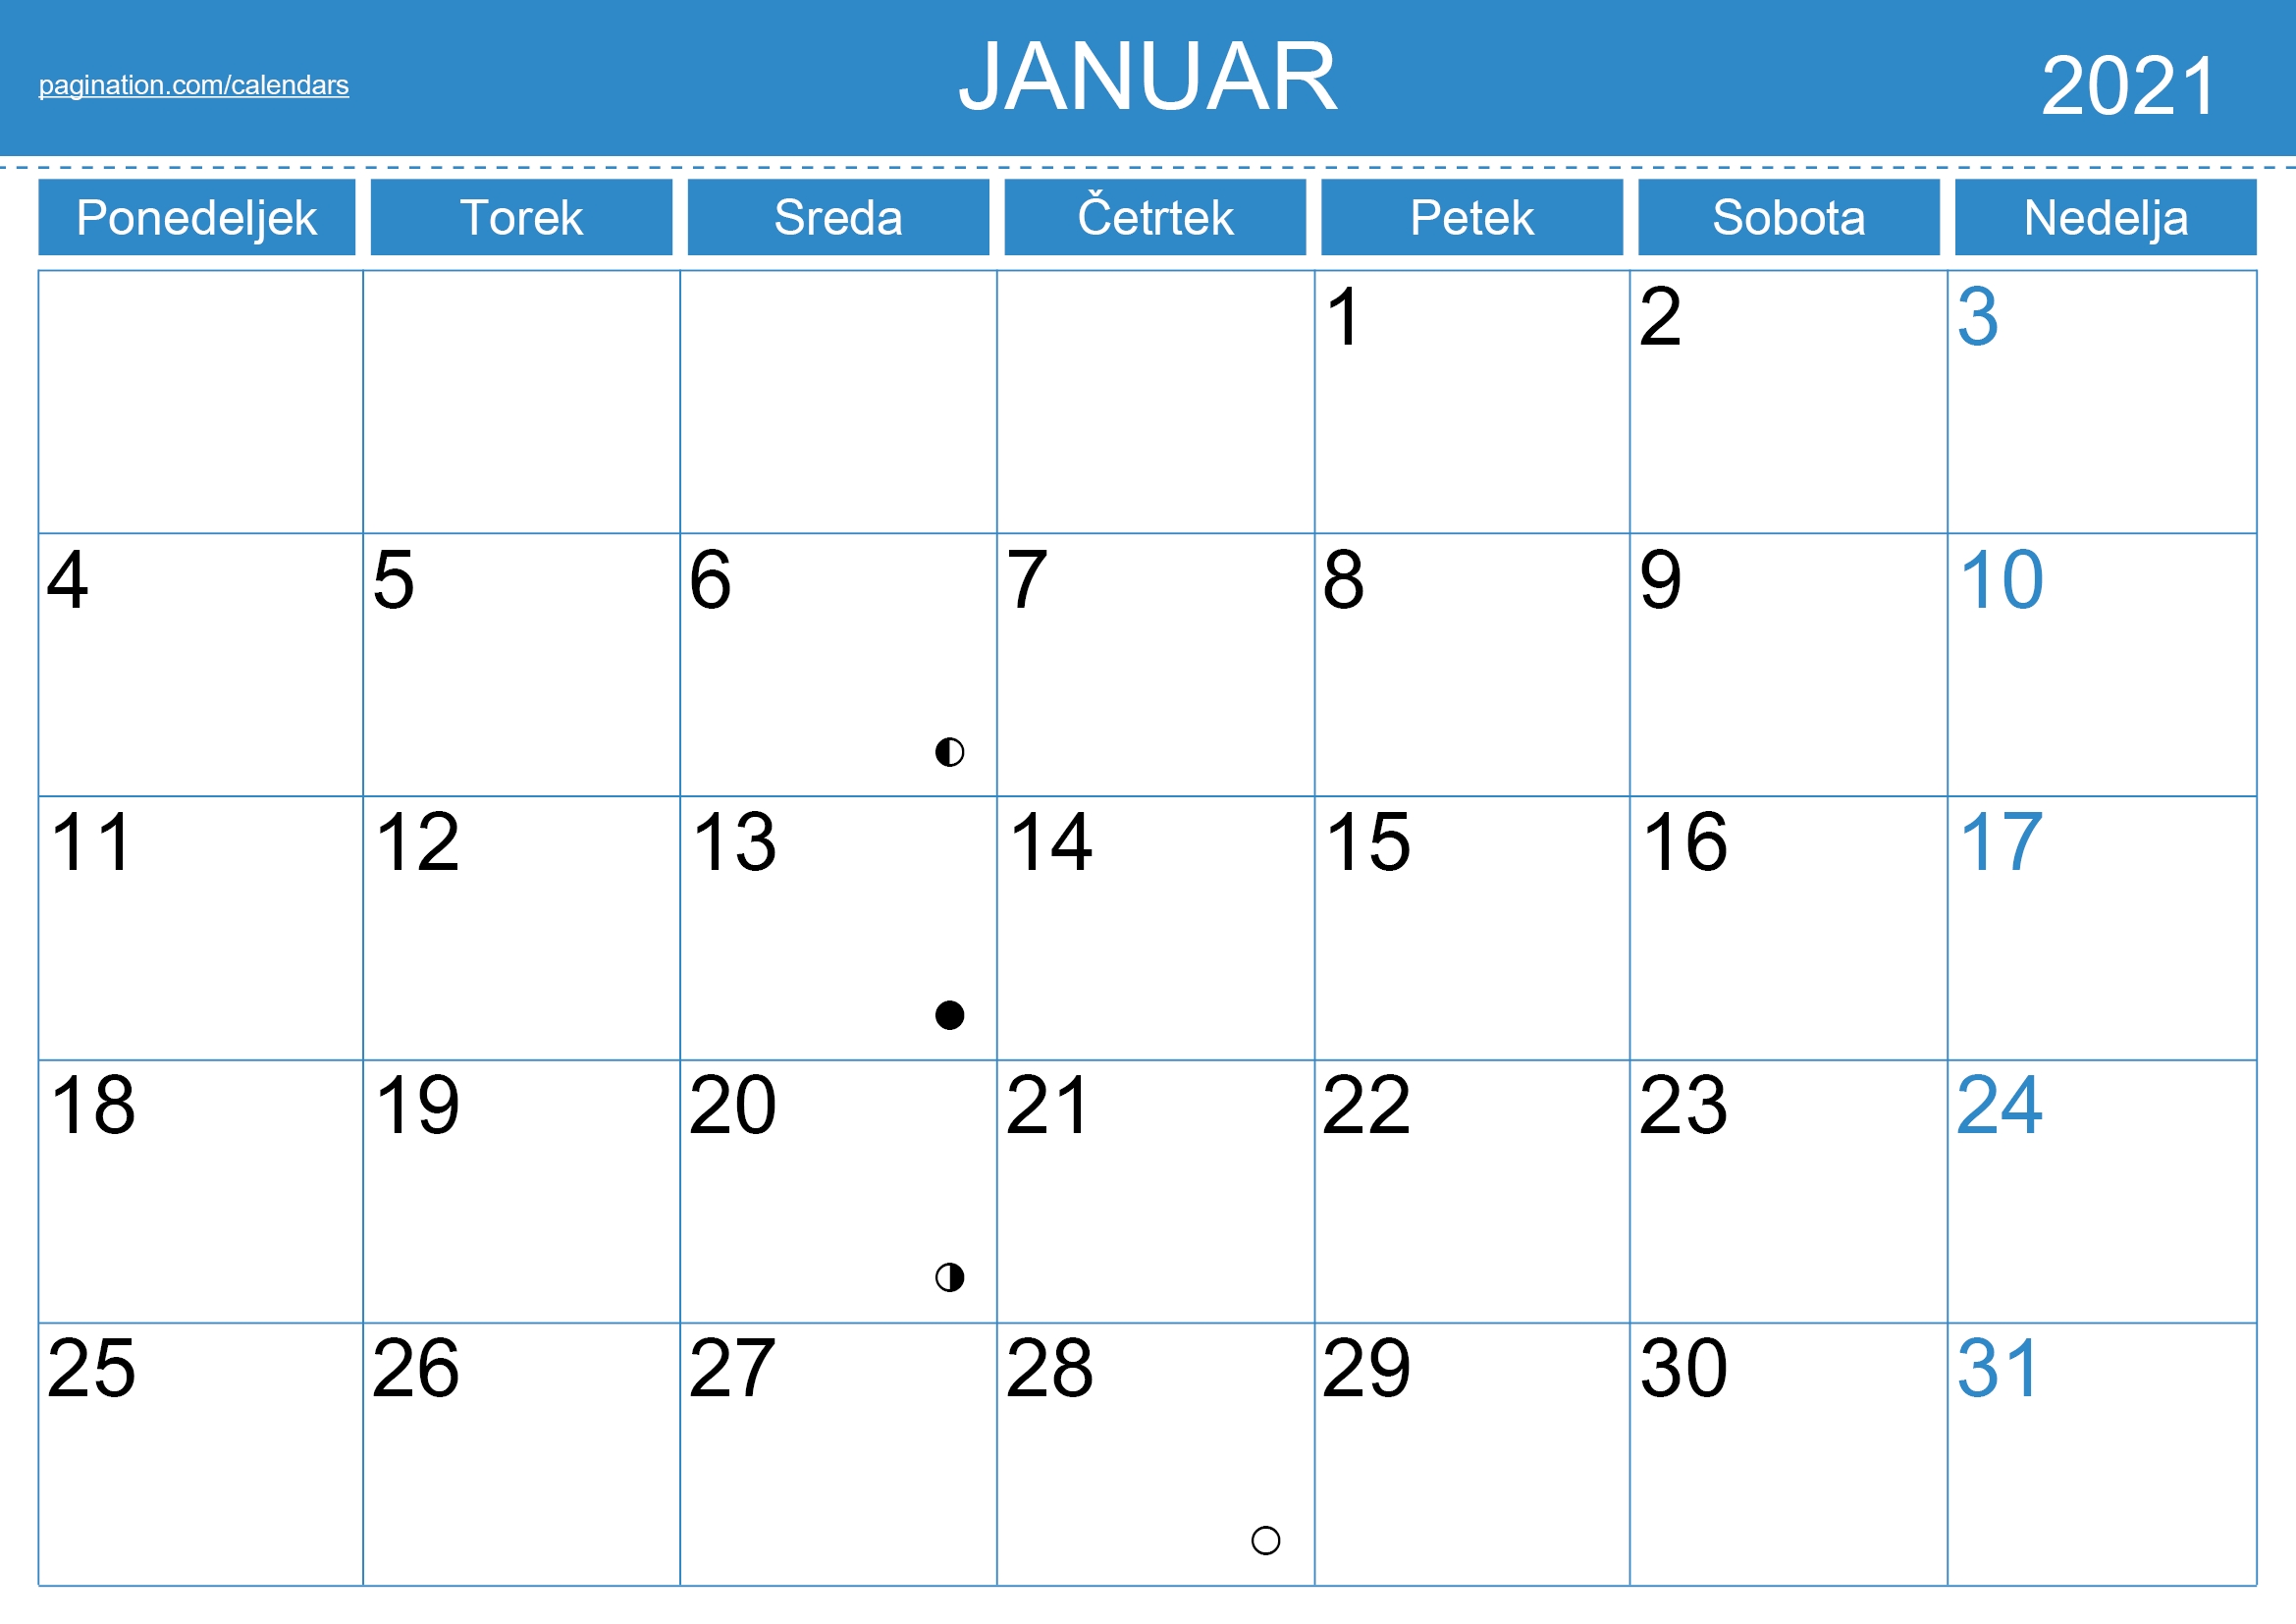 Koledar Indesign - Slovensko (Slovenian) - Pagination with regard to Calendar Template 2021 Indesign